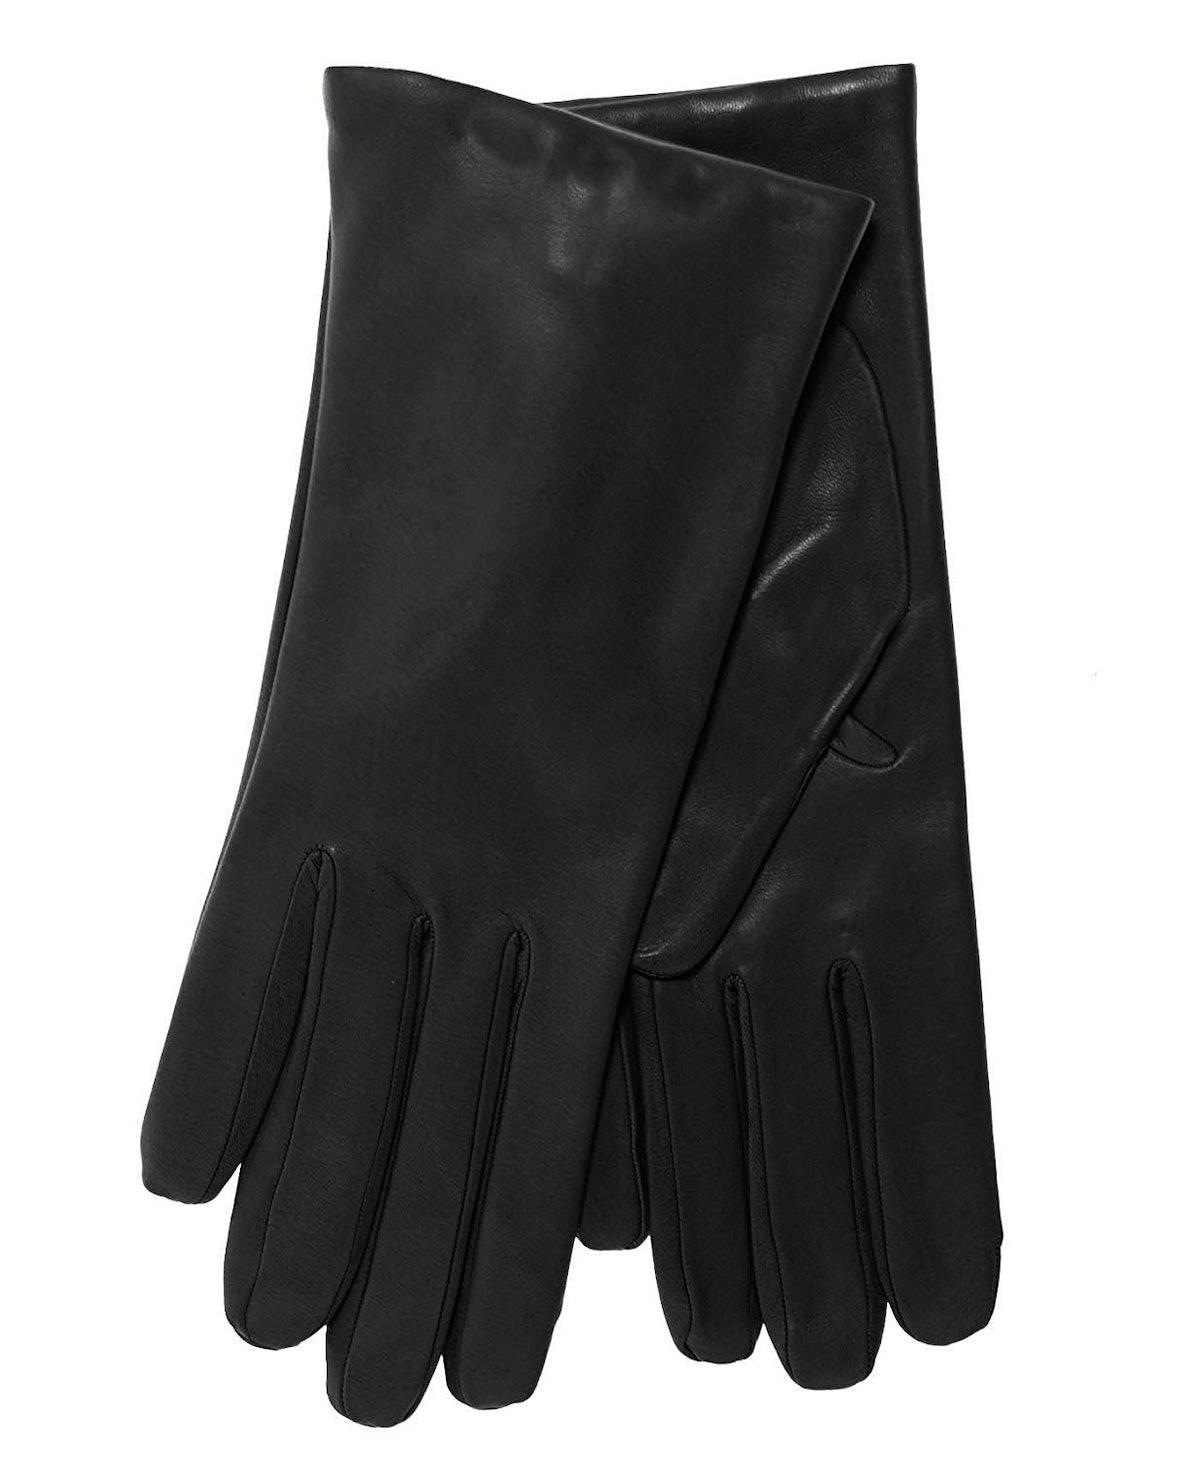 Fratelli Orsini Women's Leather Gloves